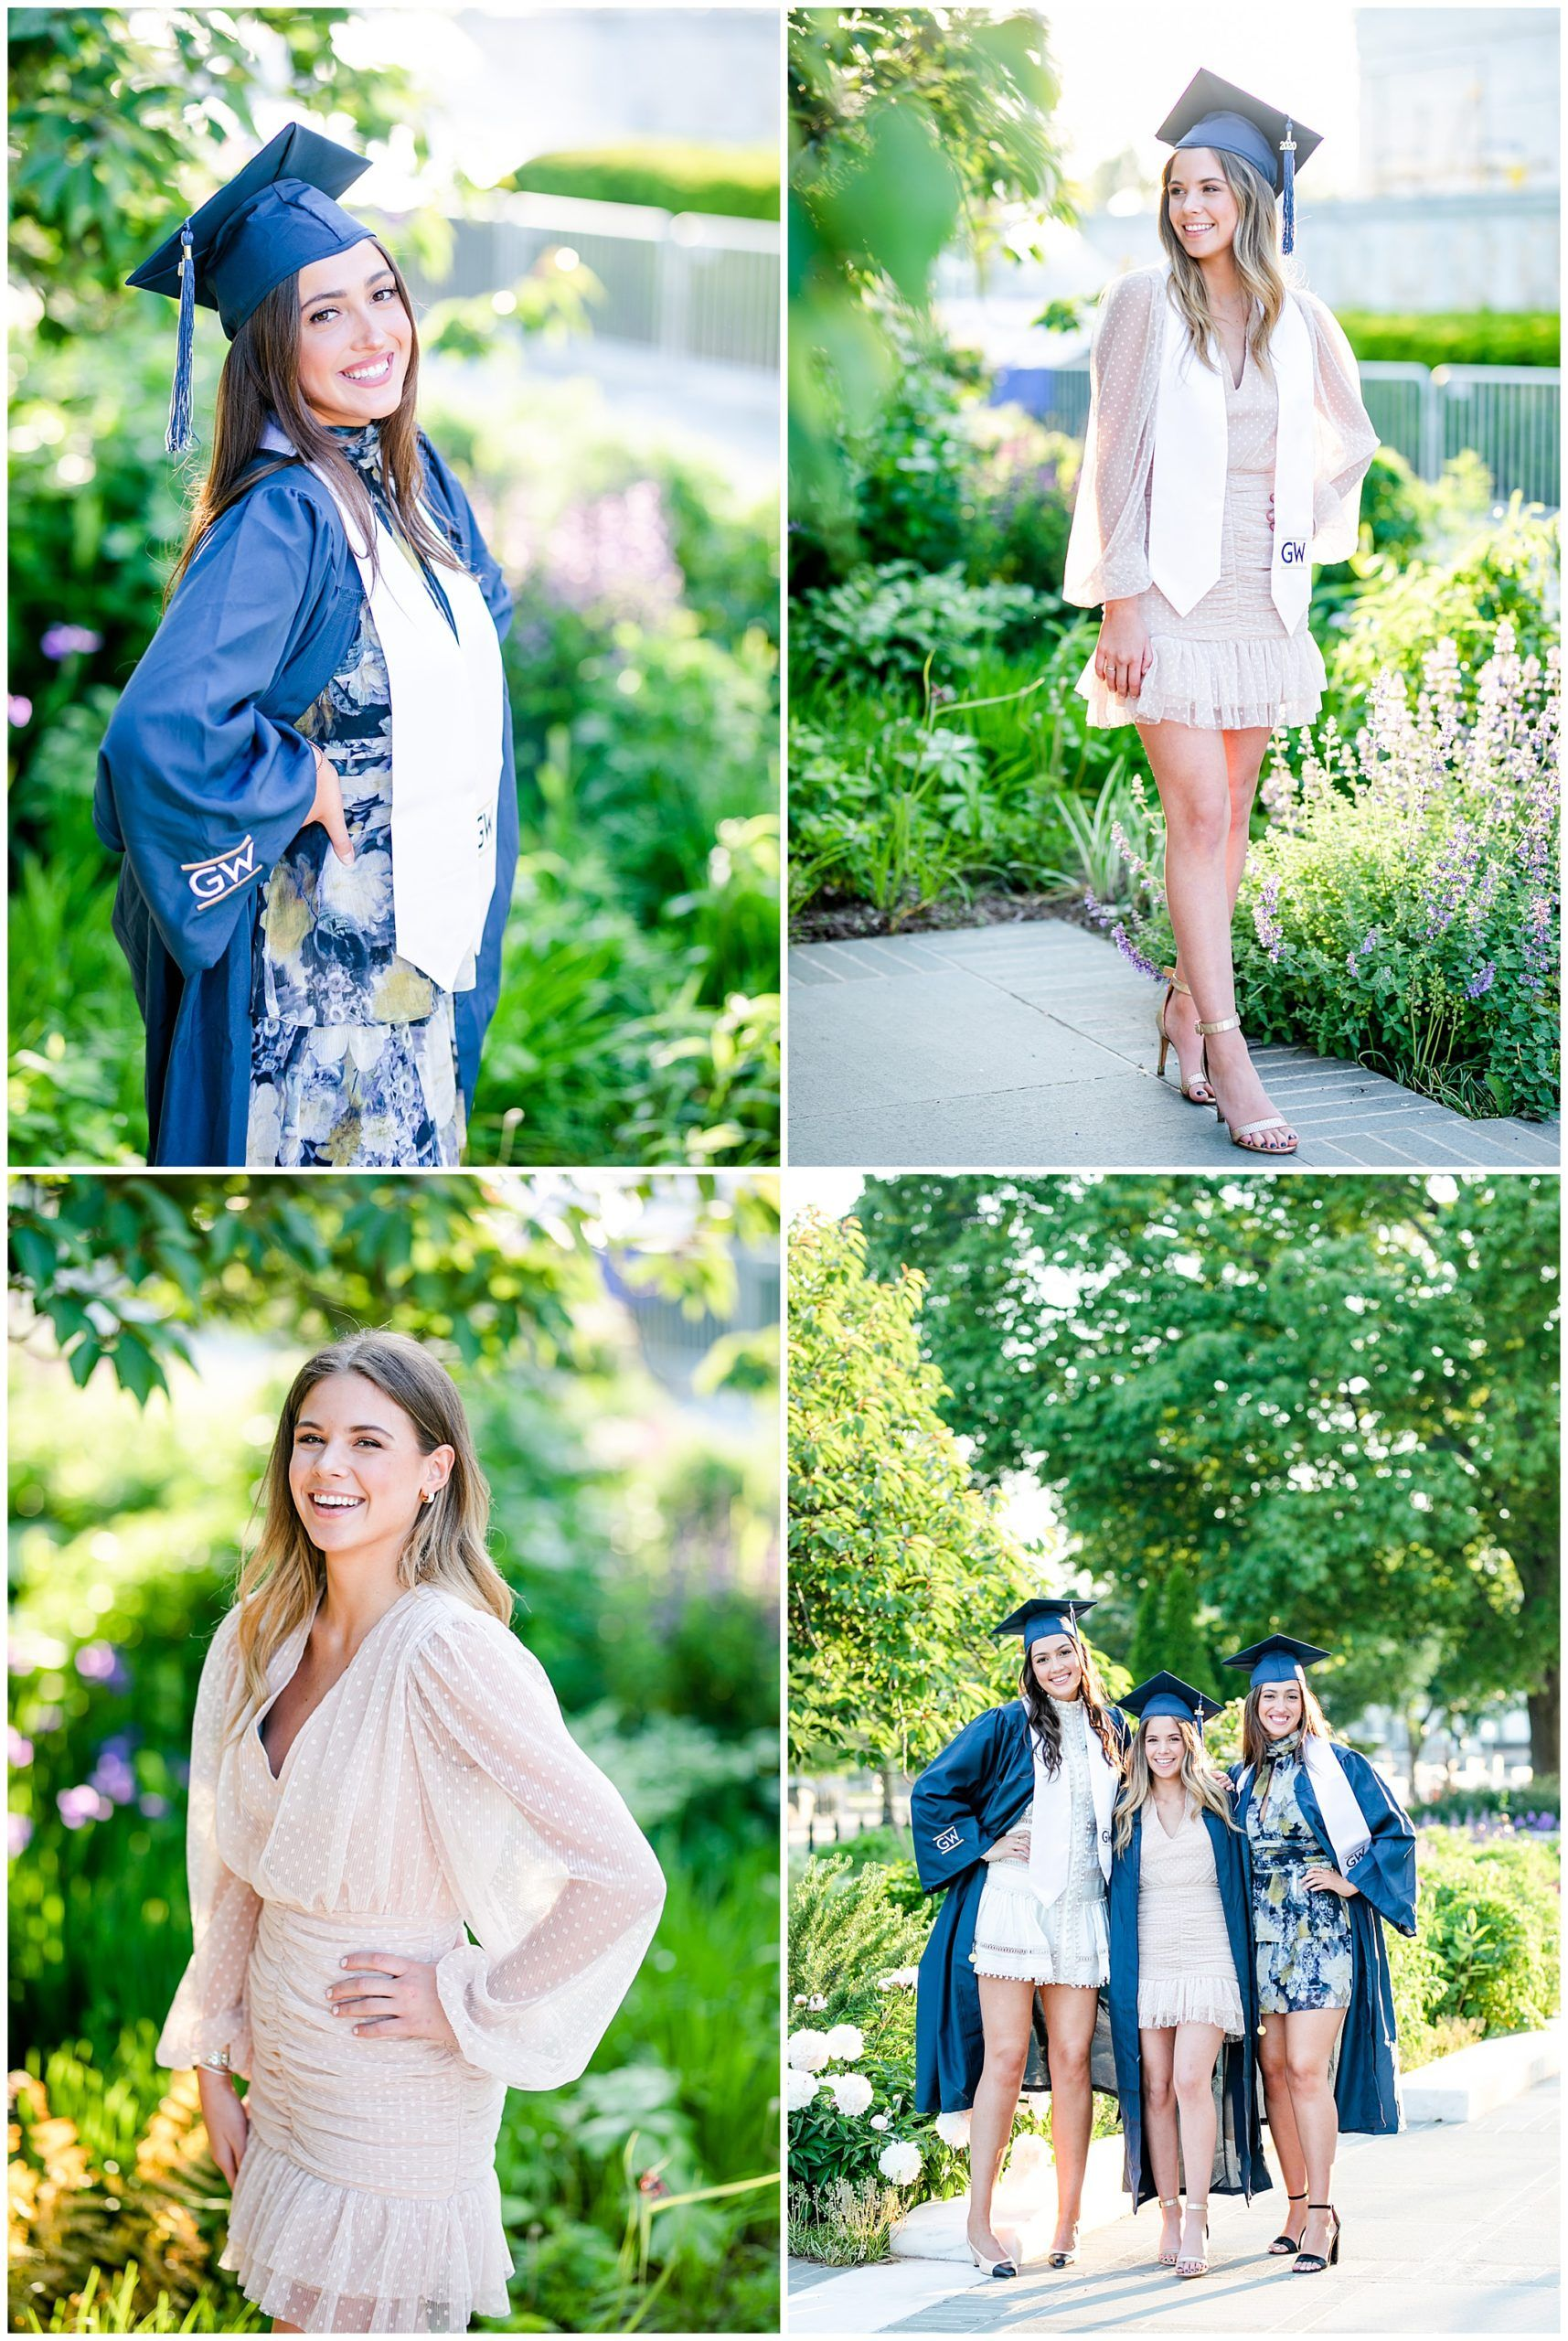 Gw Graduation Photos Showit Blog Graduation Photos Senior Portrait Outfits Graduation Photoshoot